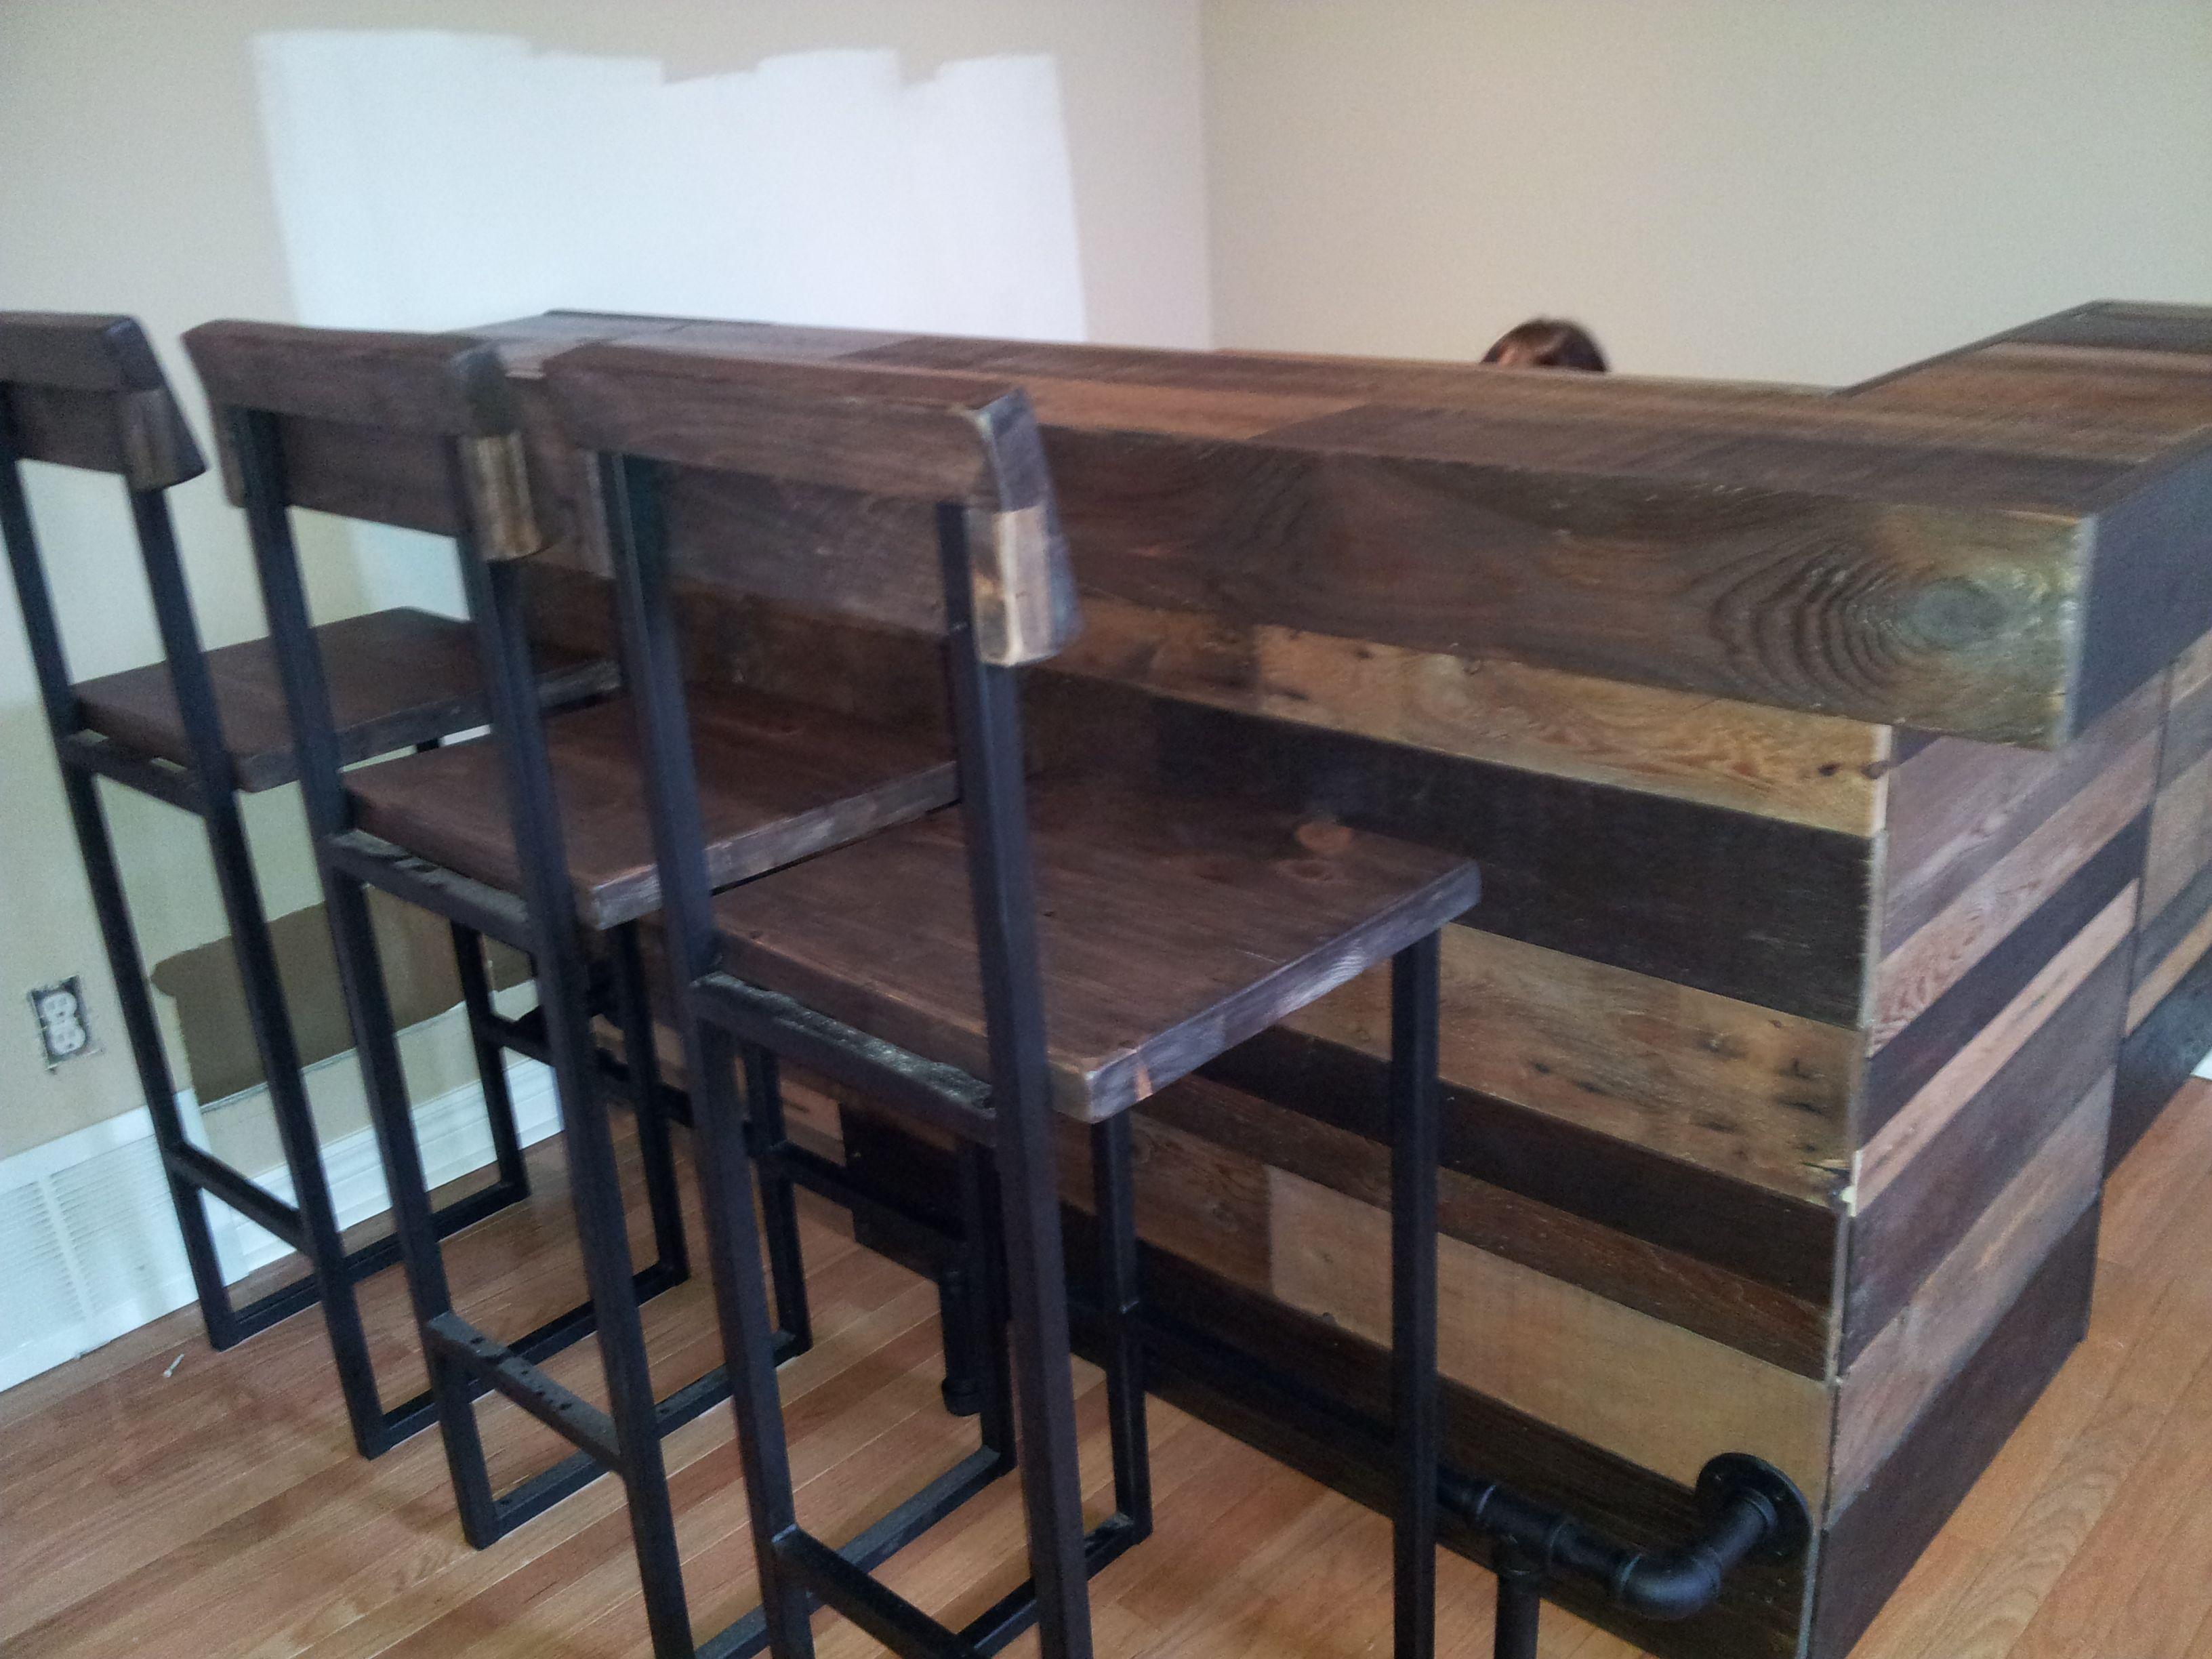 Upclaimed wood pallet bar future bar for Pallet wood bar